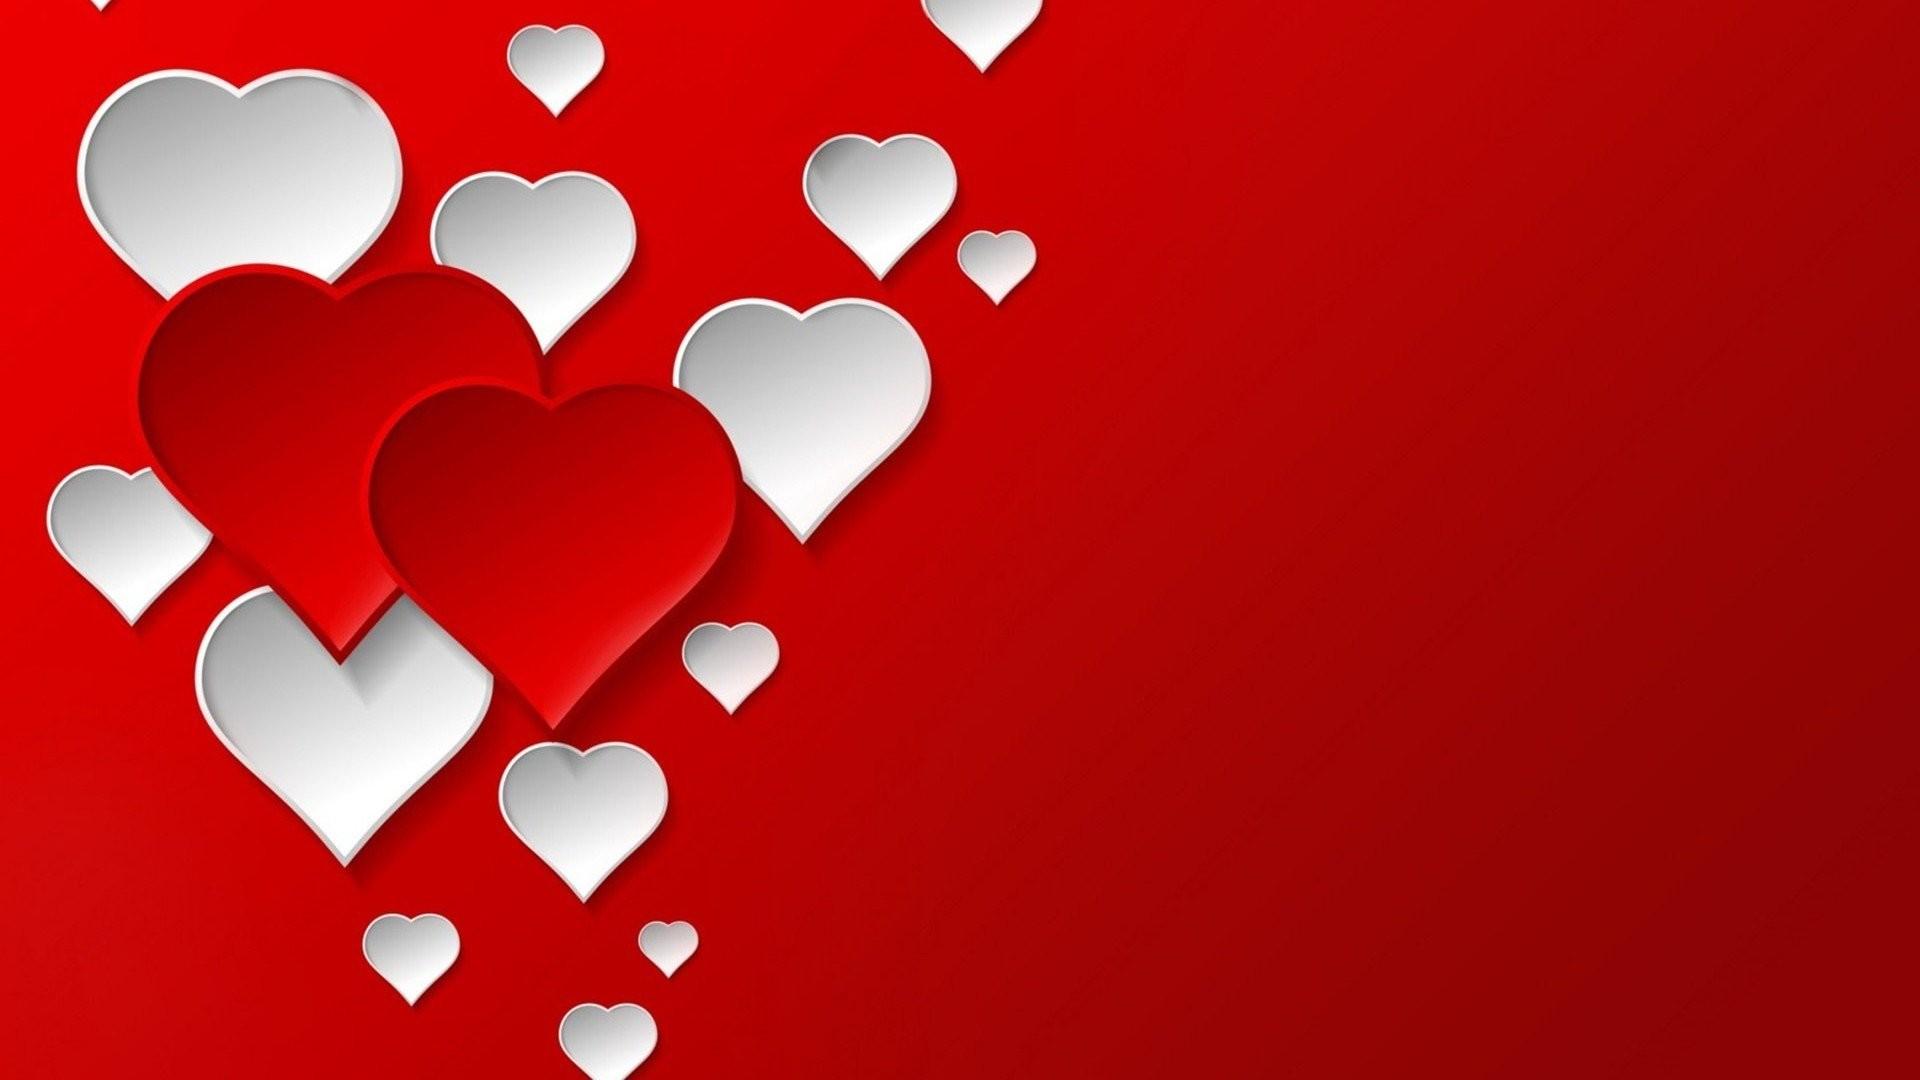 Broken Heart Wallpapers Wallpaper 1920×1080 Heart Pics Wallpapers (34  Wallpapers)   Adorable